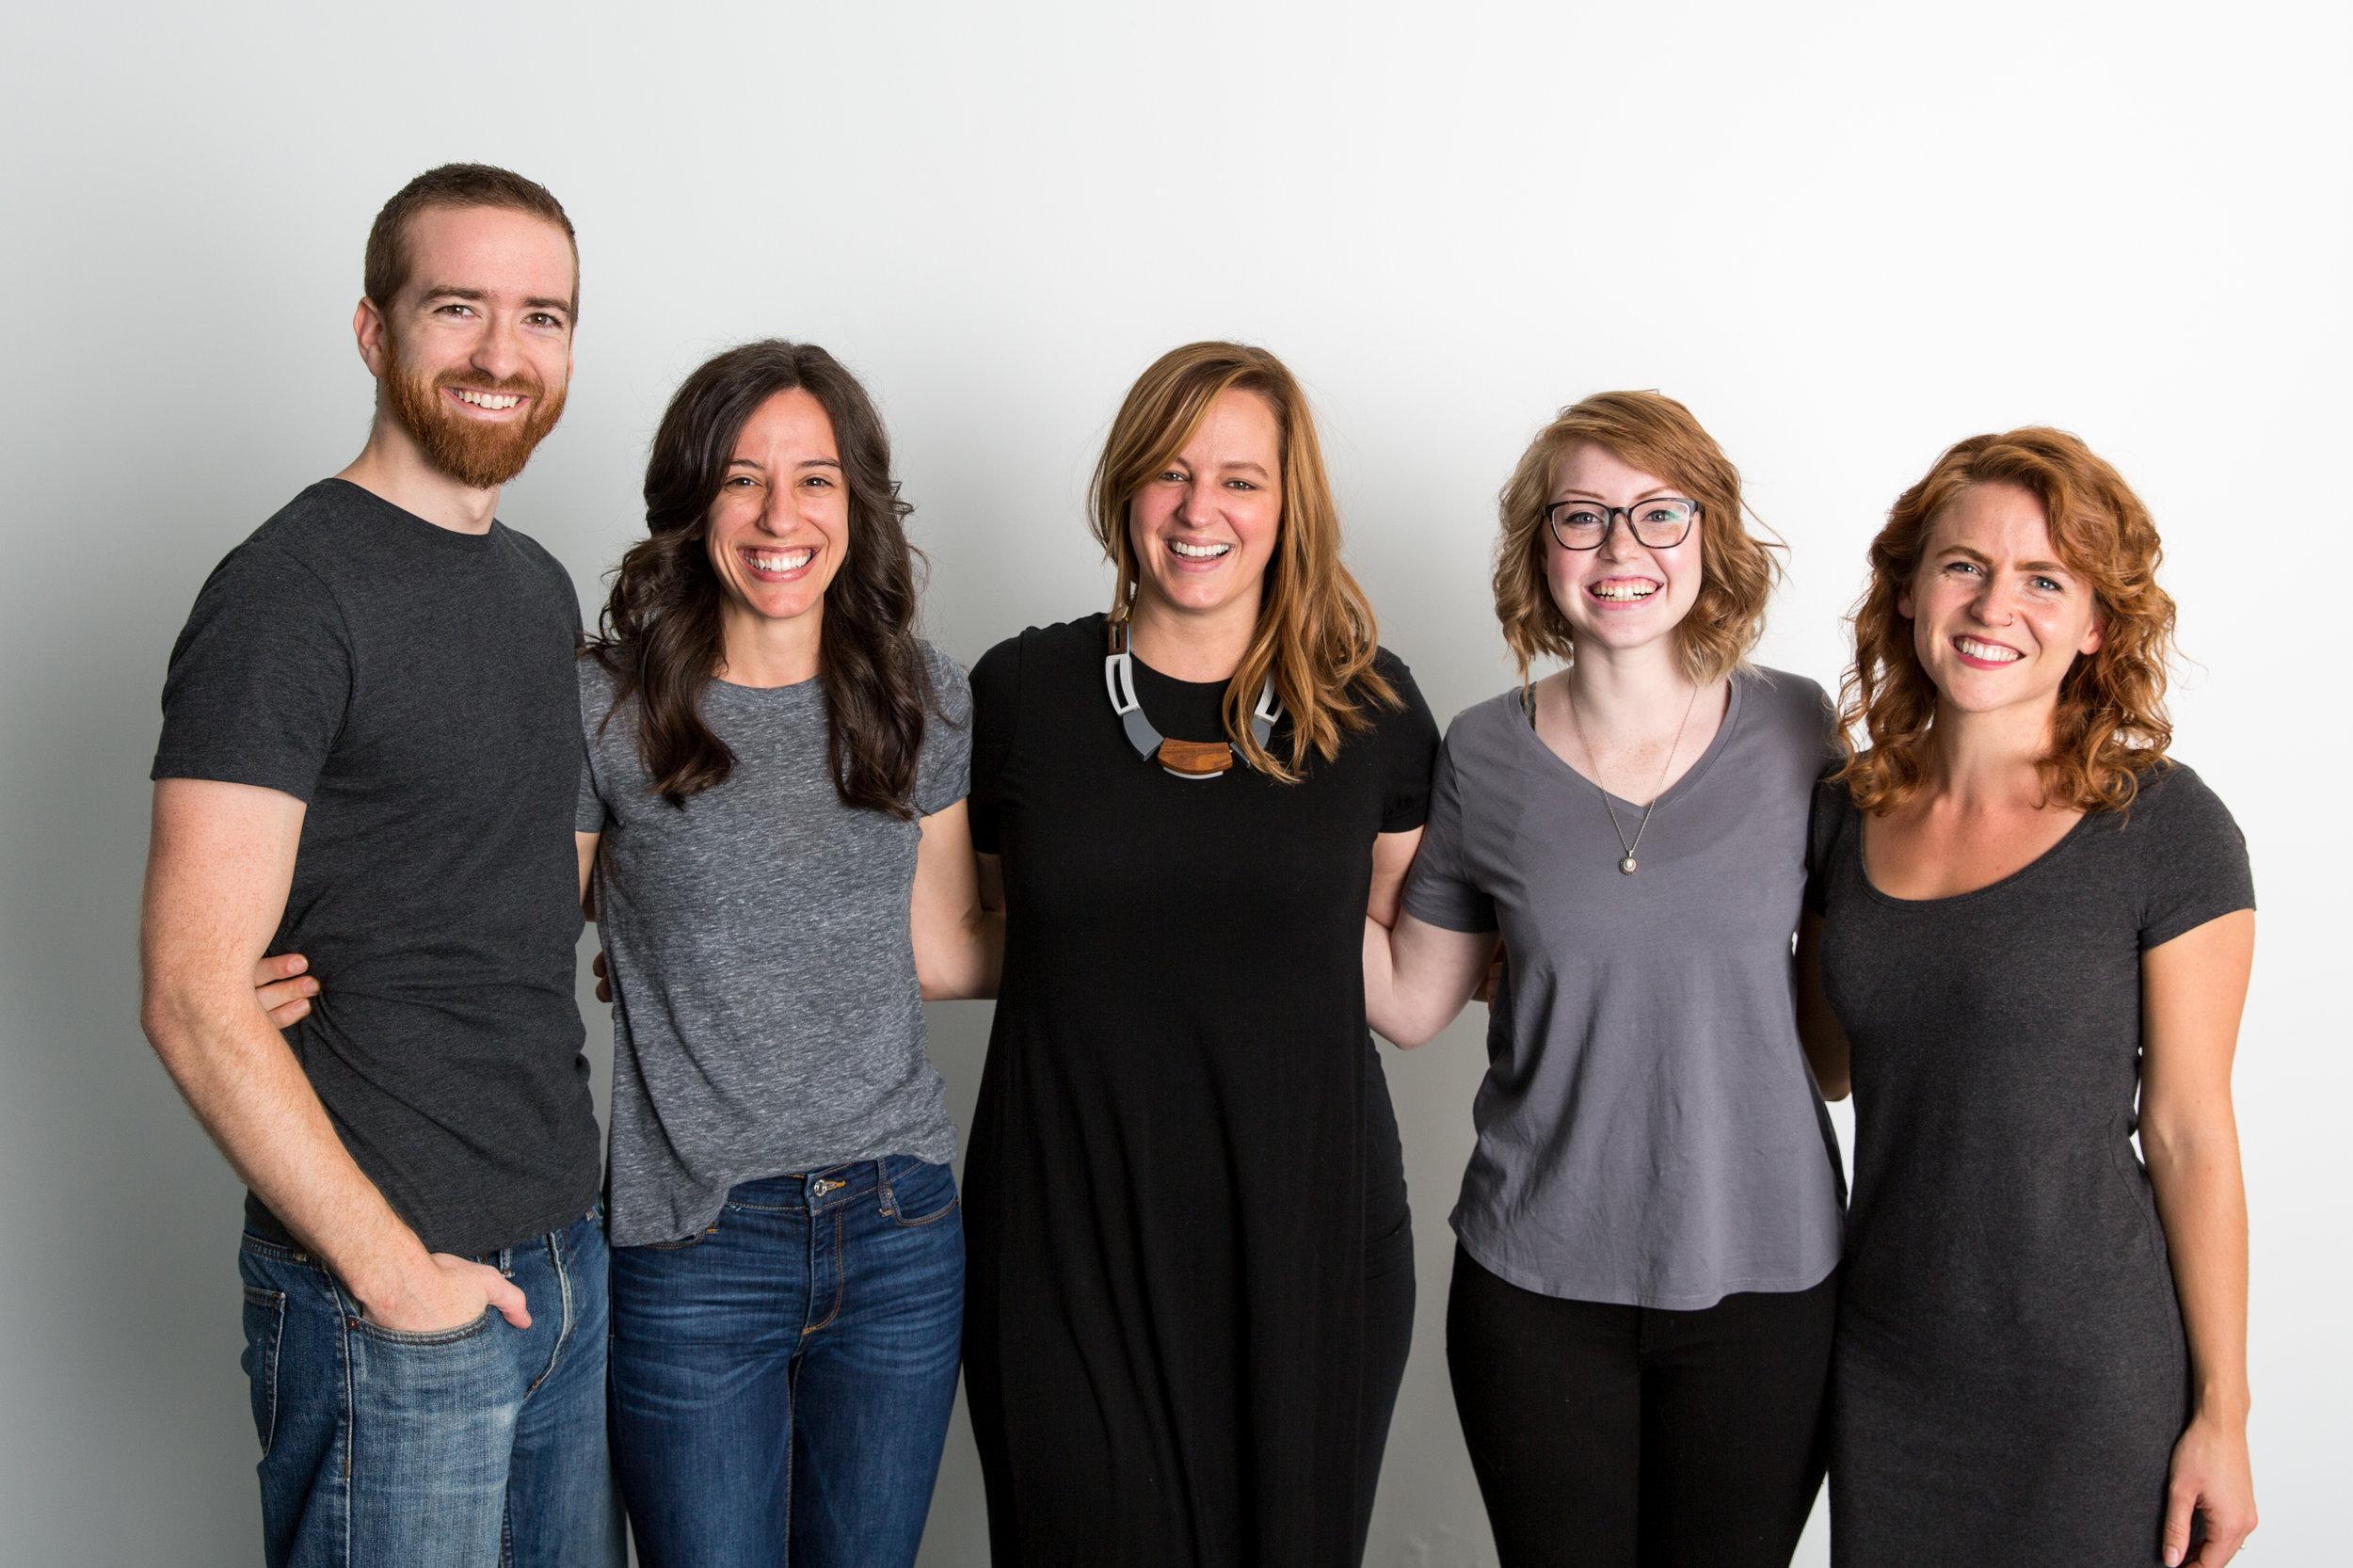 Burt Co. Team: Ethan and Bethany, Kaylene, Shelby and Me